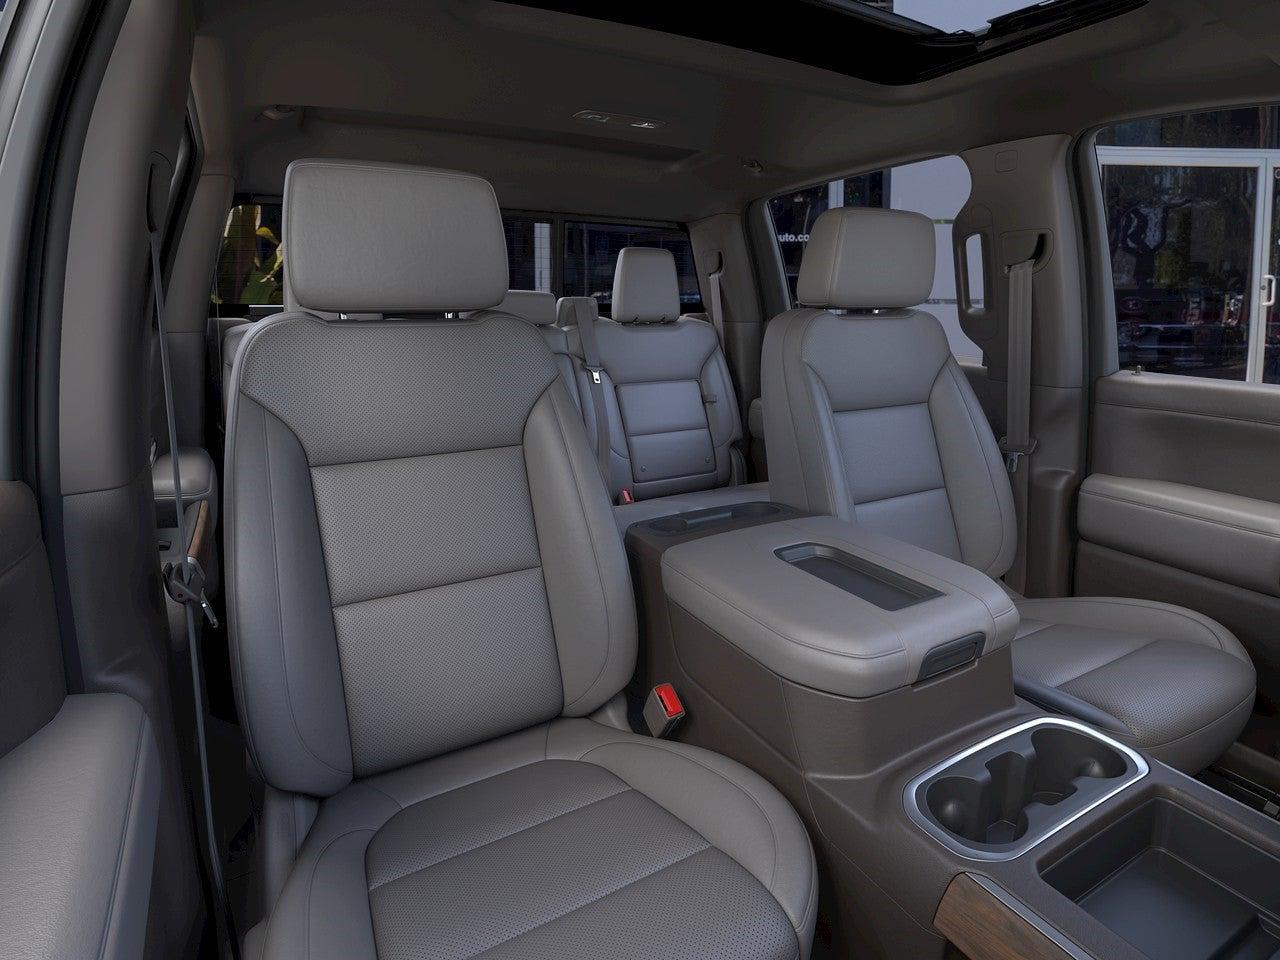 2021 GMC Sierra 1500 Crew Cab 4x4, Pickup #T21449 - photo 33